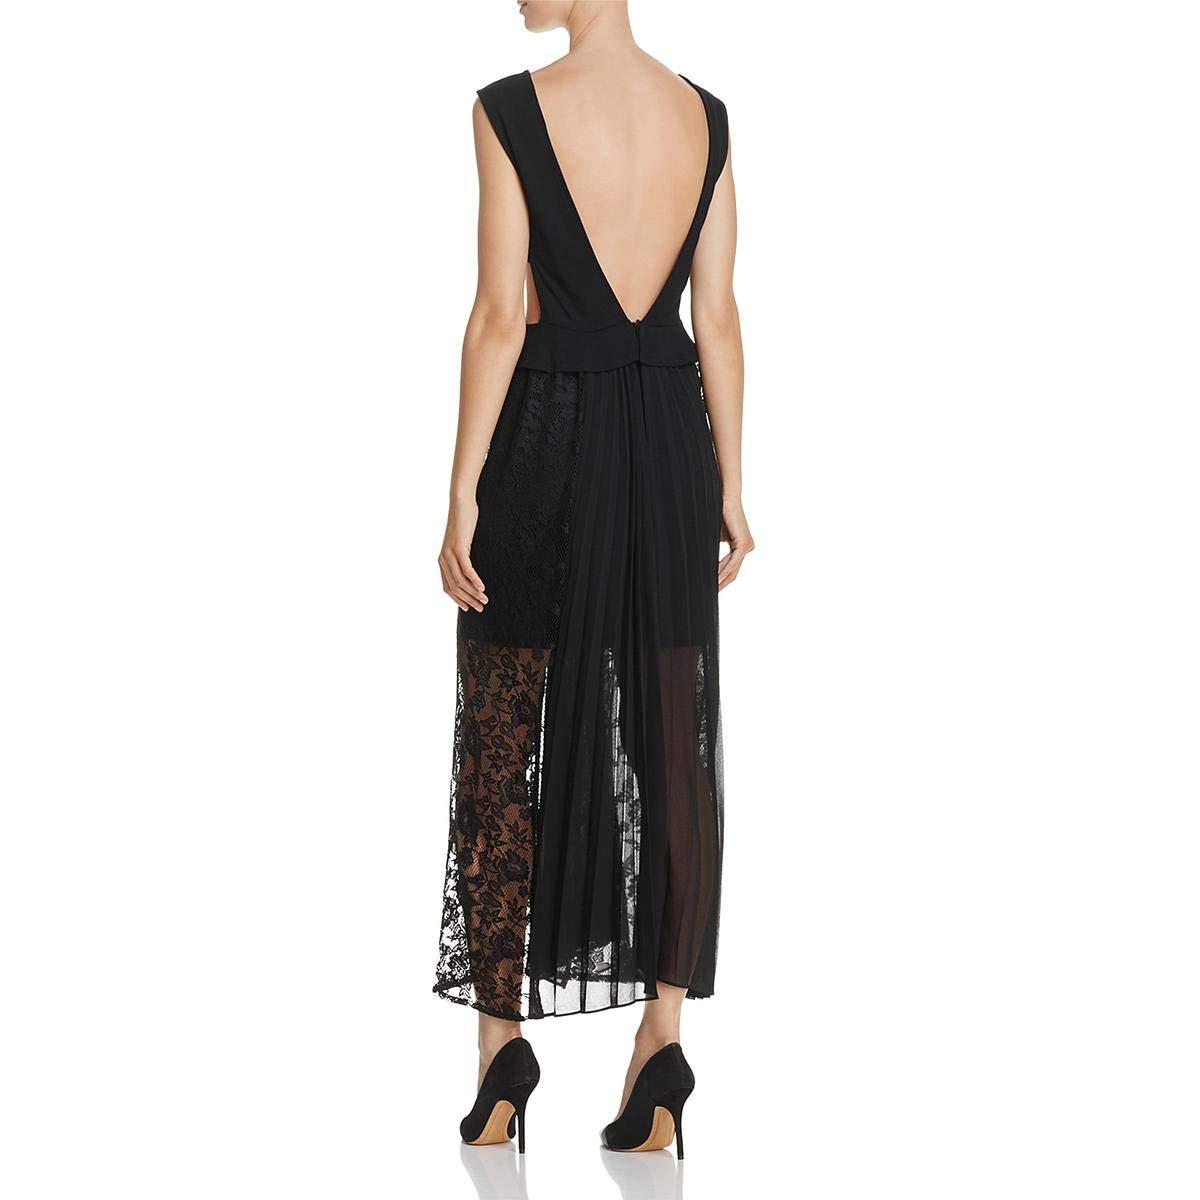 fdd8882f06e French Connection Womens Angelina Plunging Neck Pleated Midi Dress Black 0:  Amazon.co.uk: Clothing